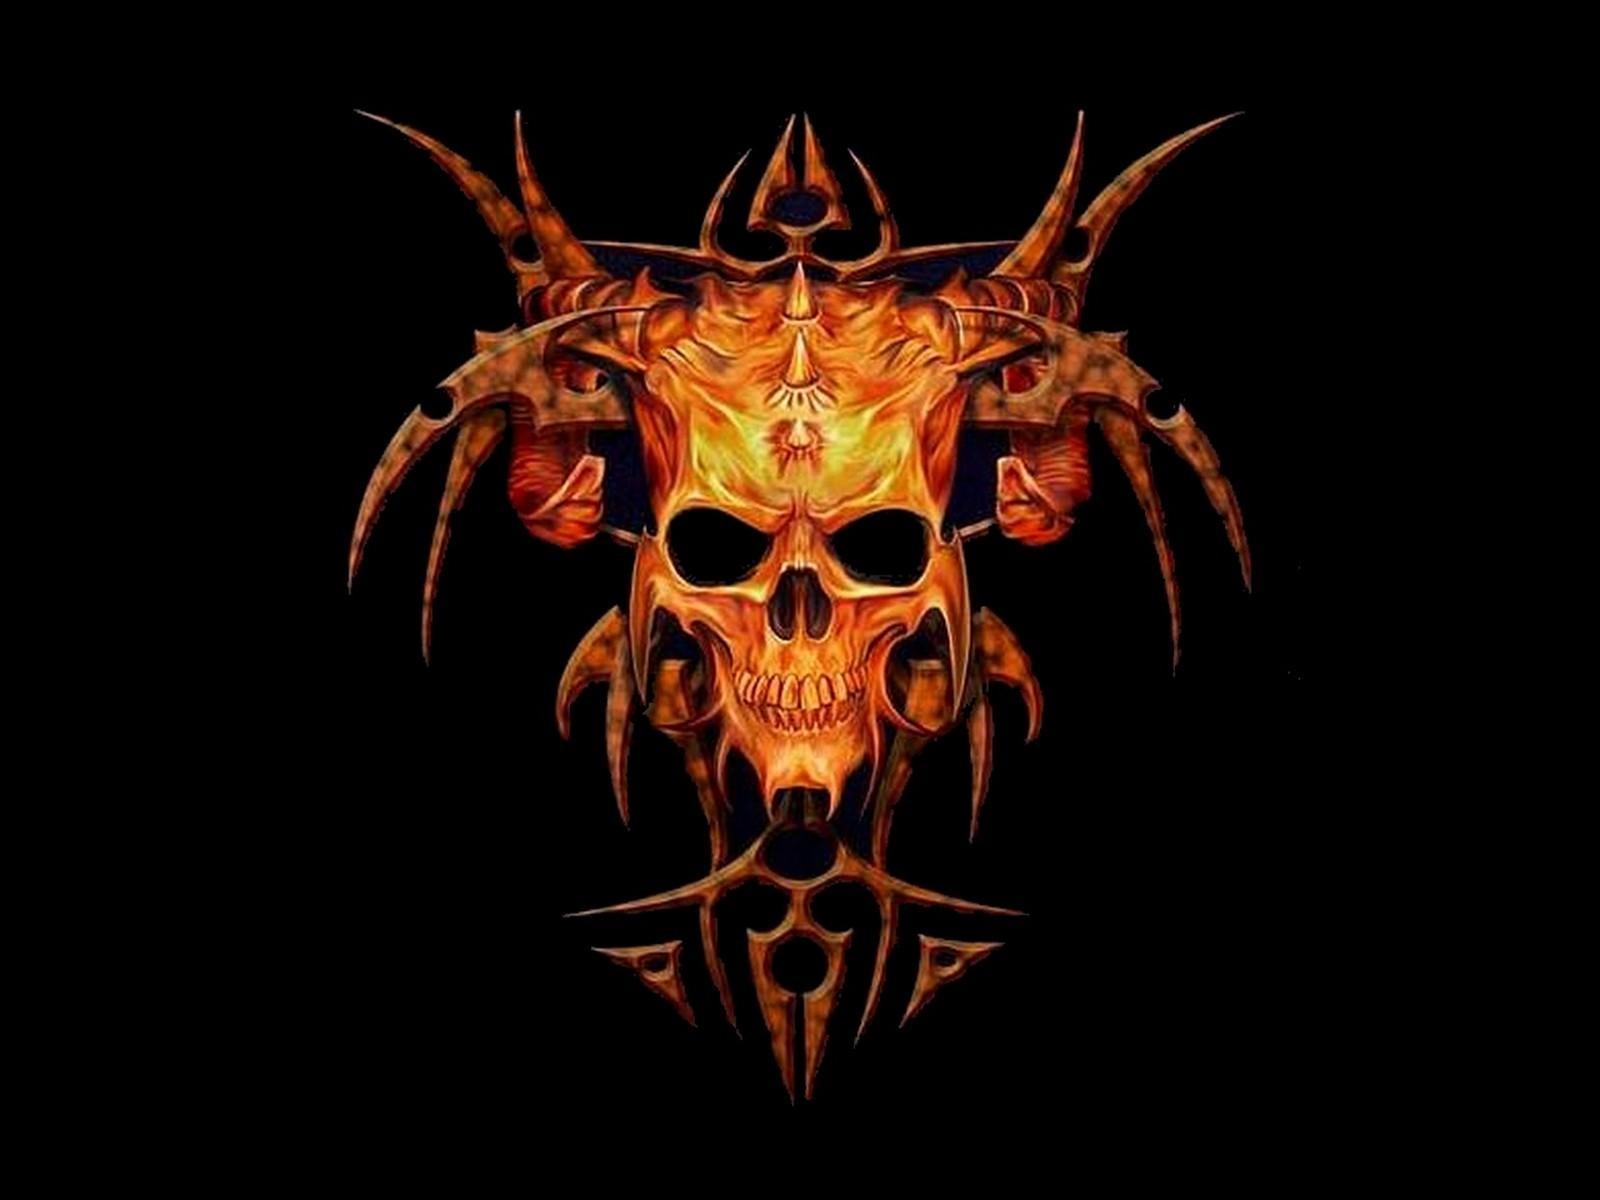 10 Top Free Skull Wallpaper Downloads FULL HD 1080p For PC Desktop